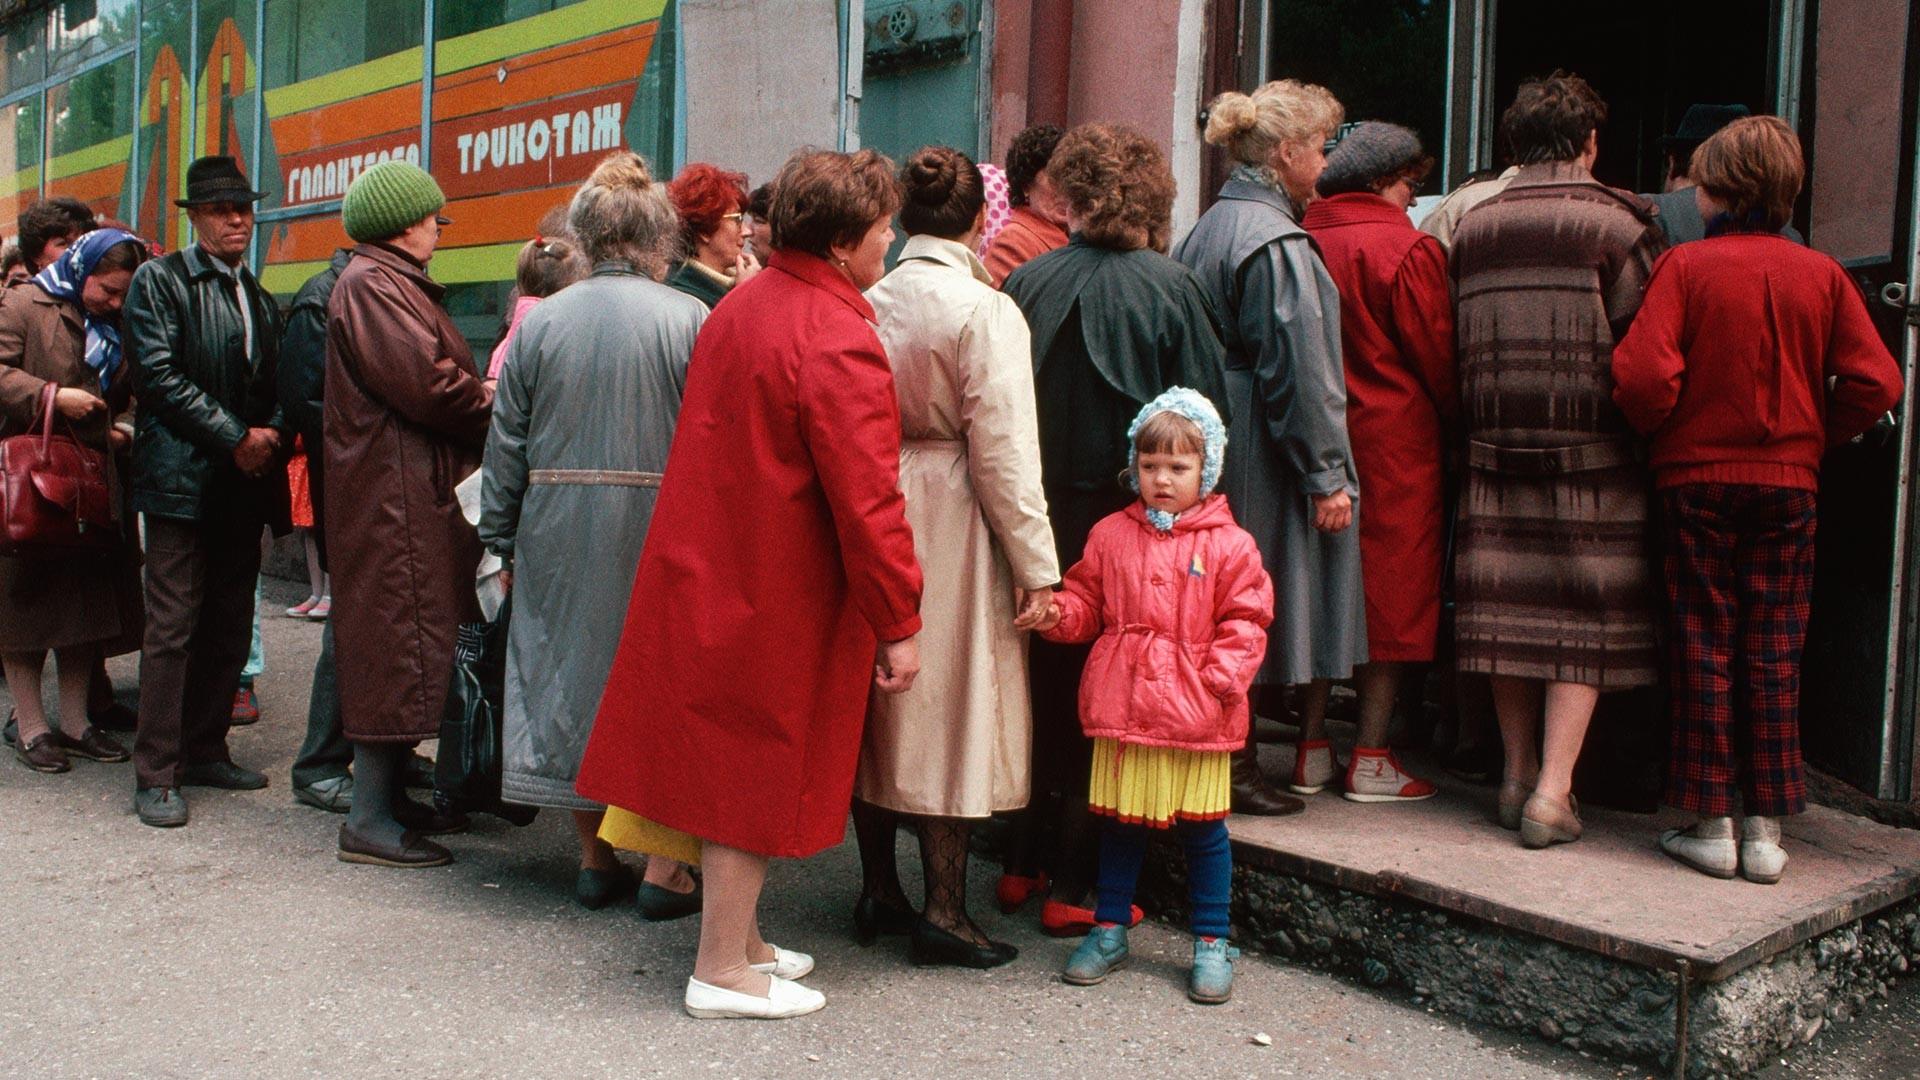 Сибирци у реду испред продавнице.